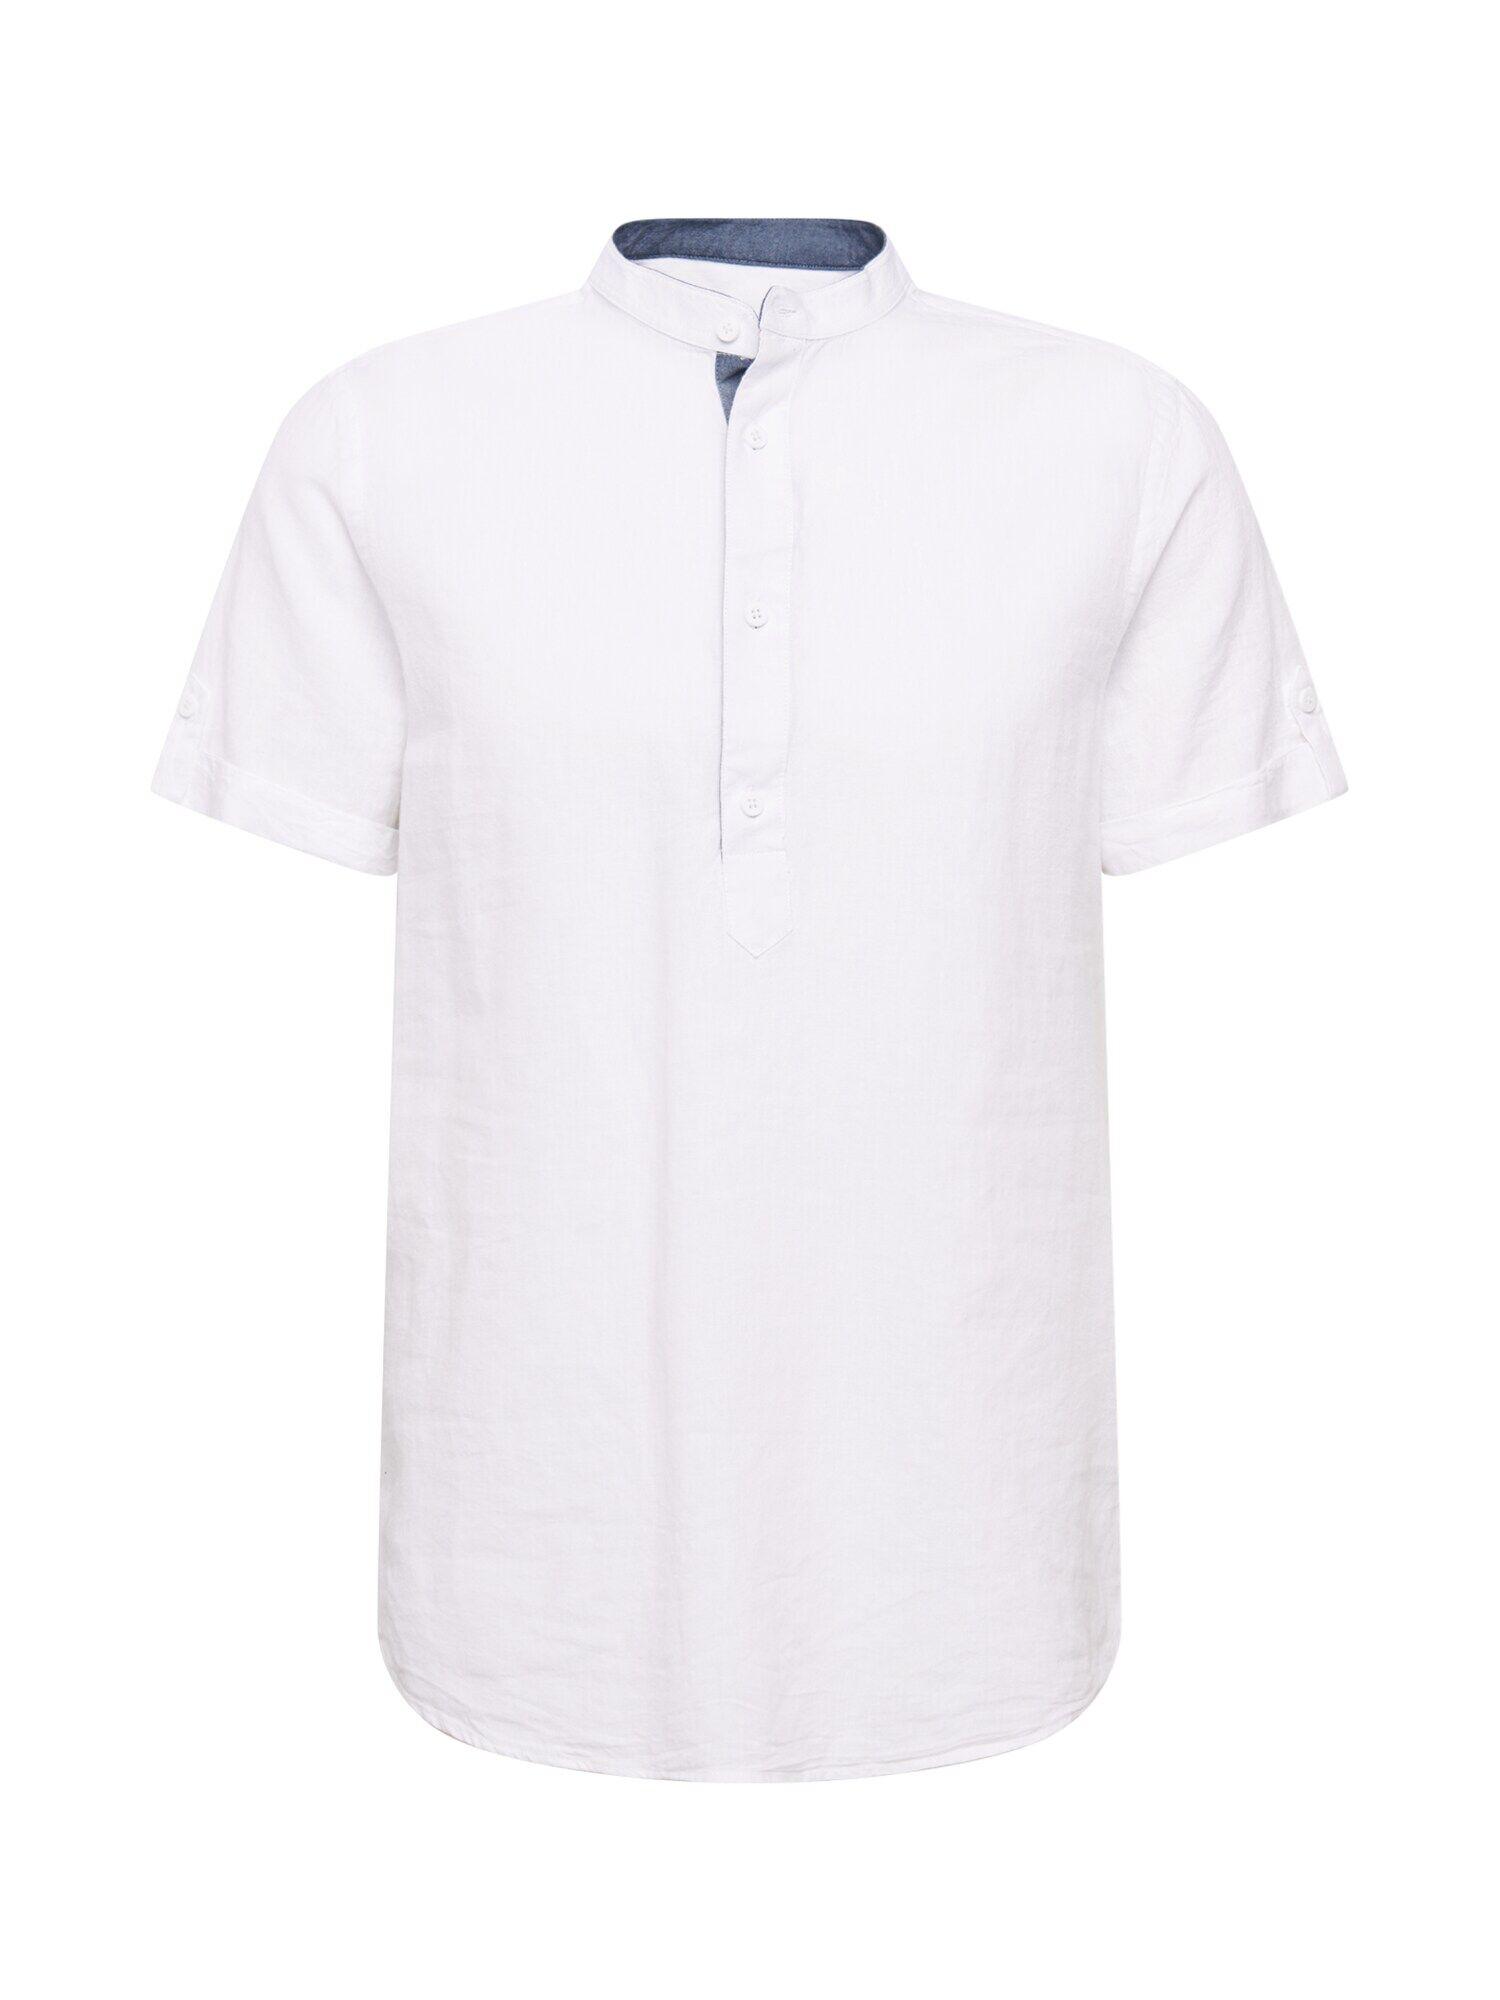 INDICODE JEANS Camicia 'Mao' Bianco